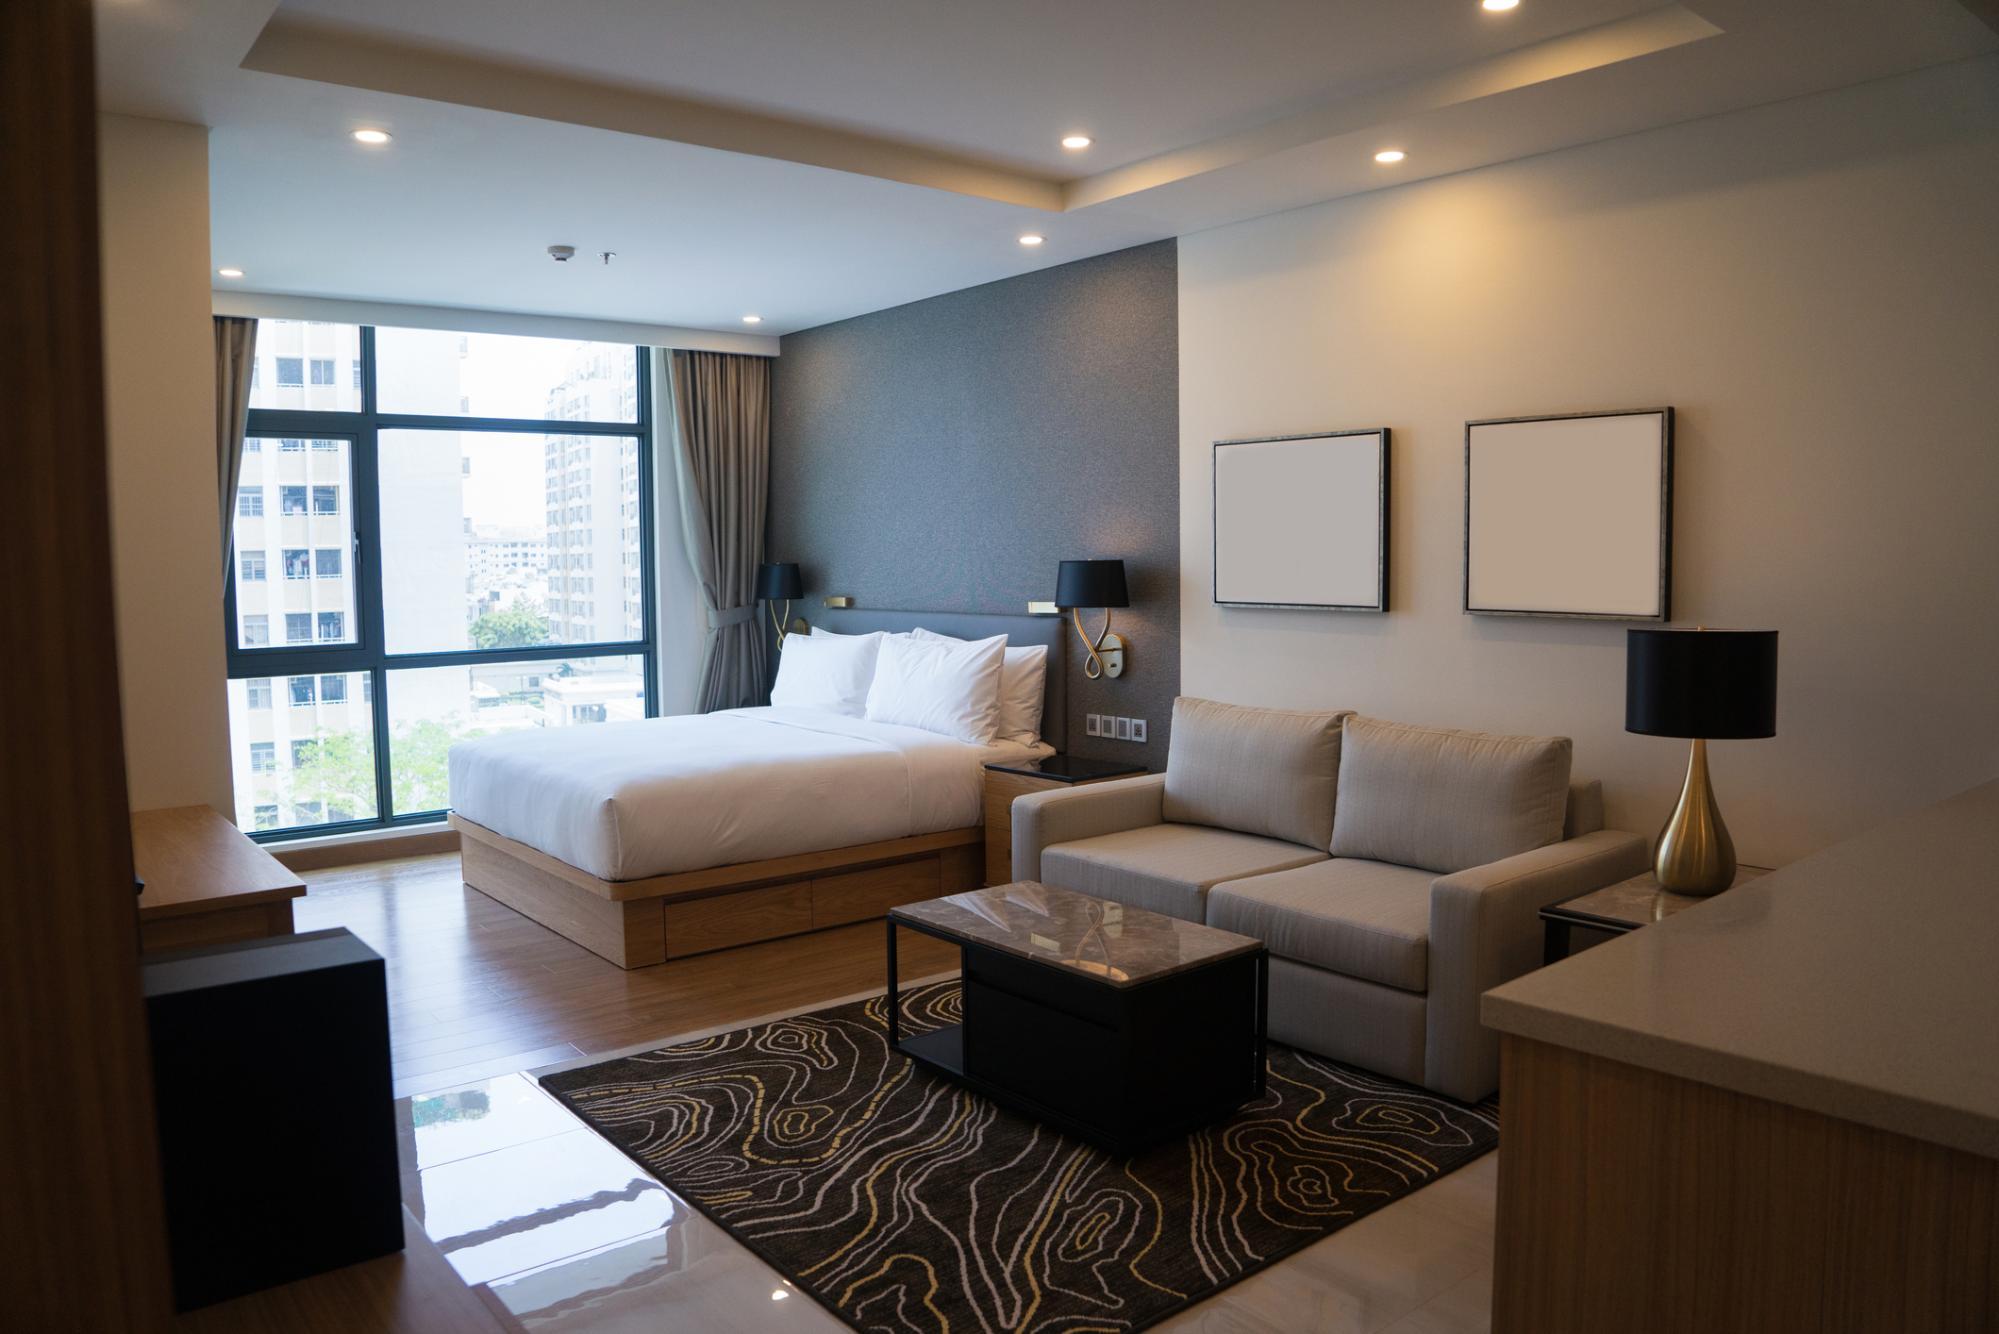 Should You Rent a Studio Apartment? | Millionacres